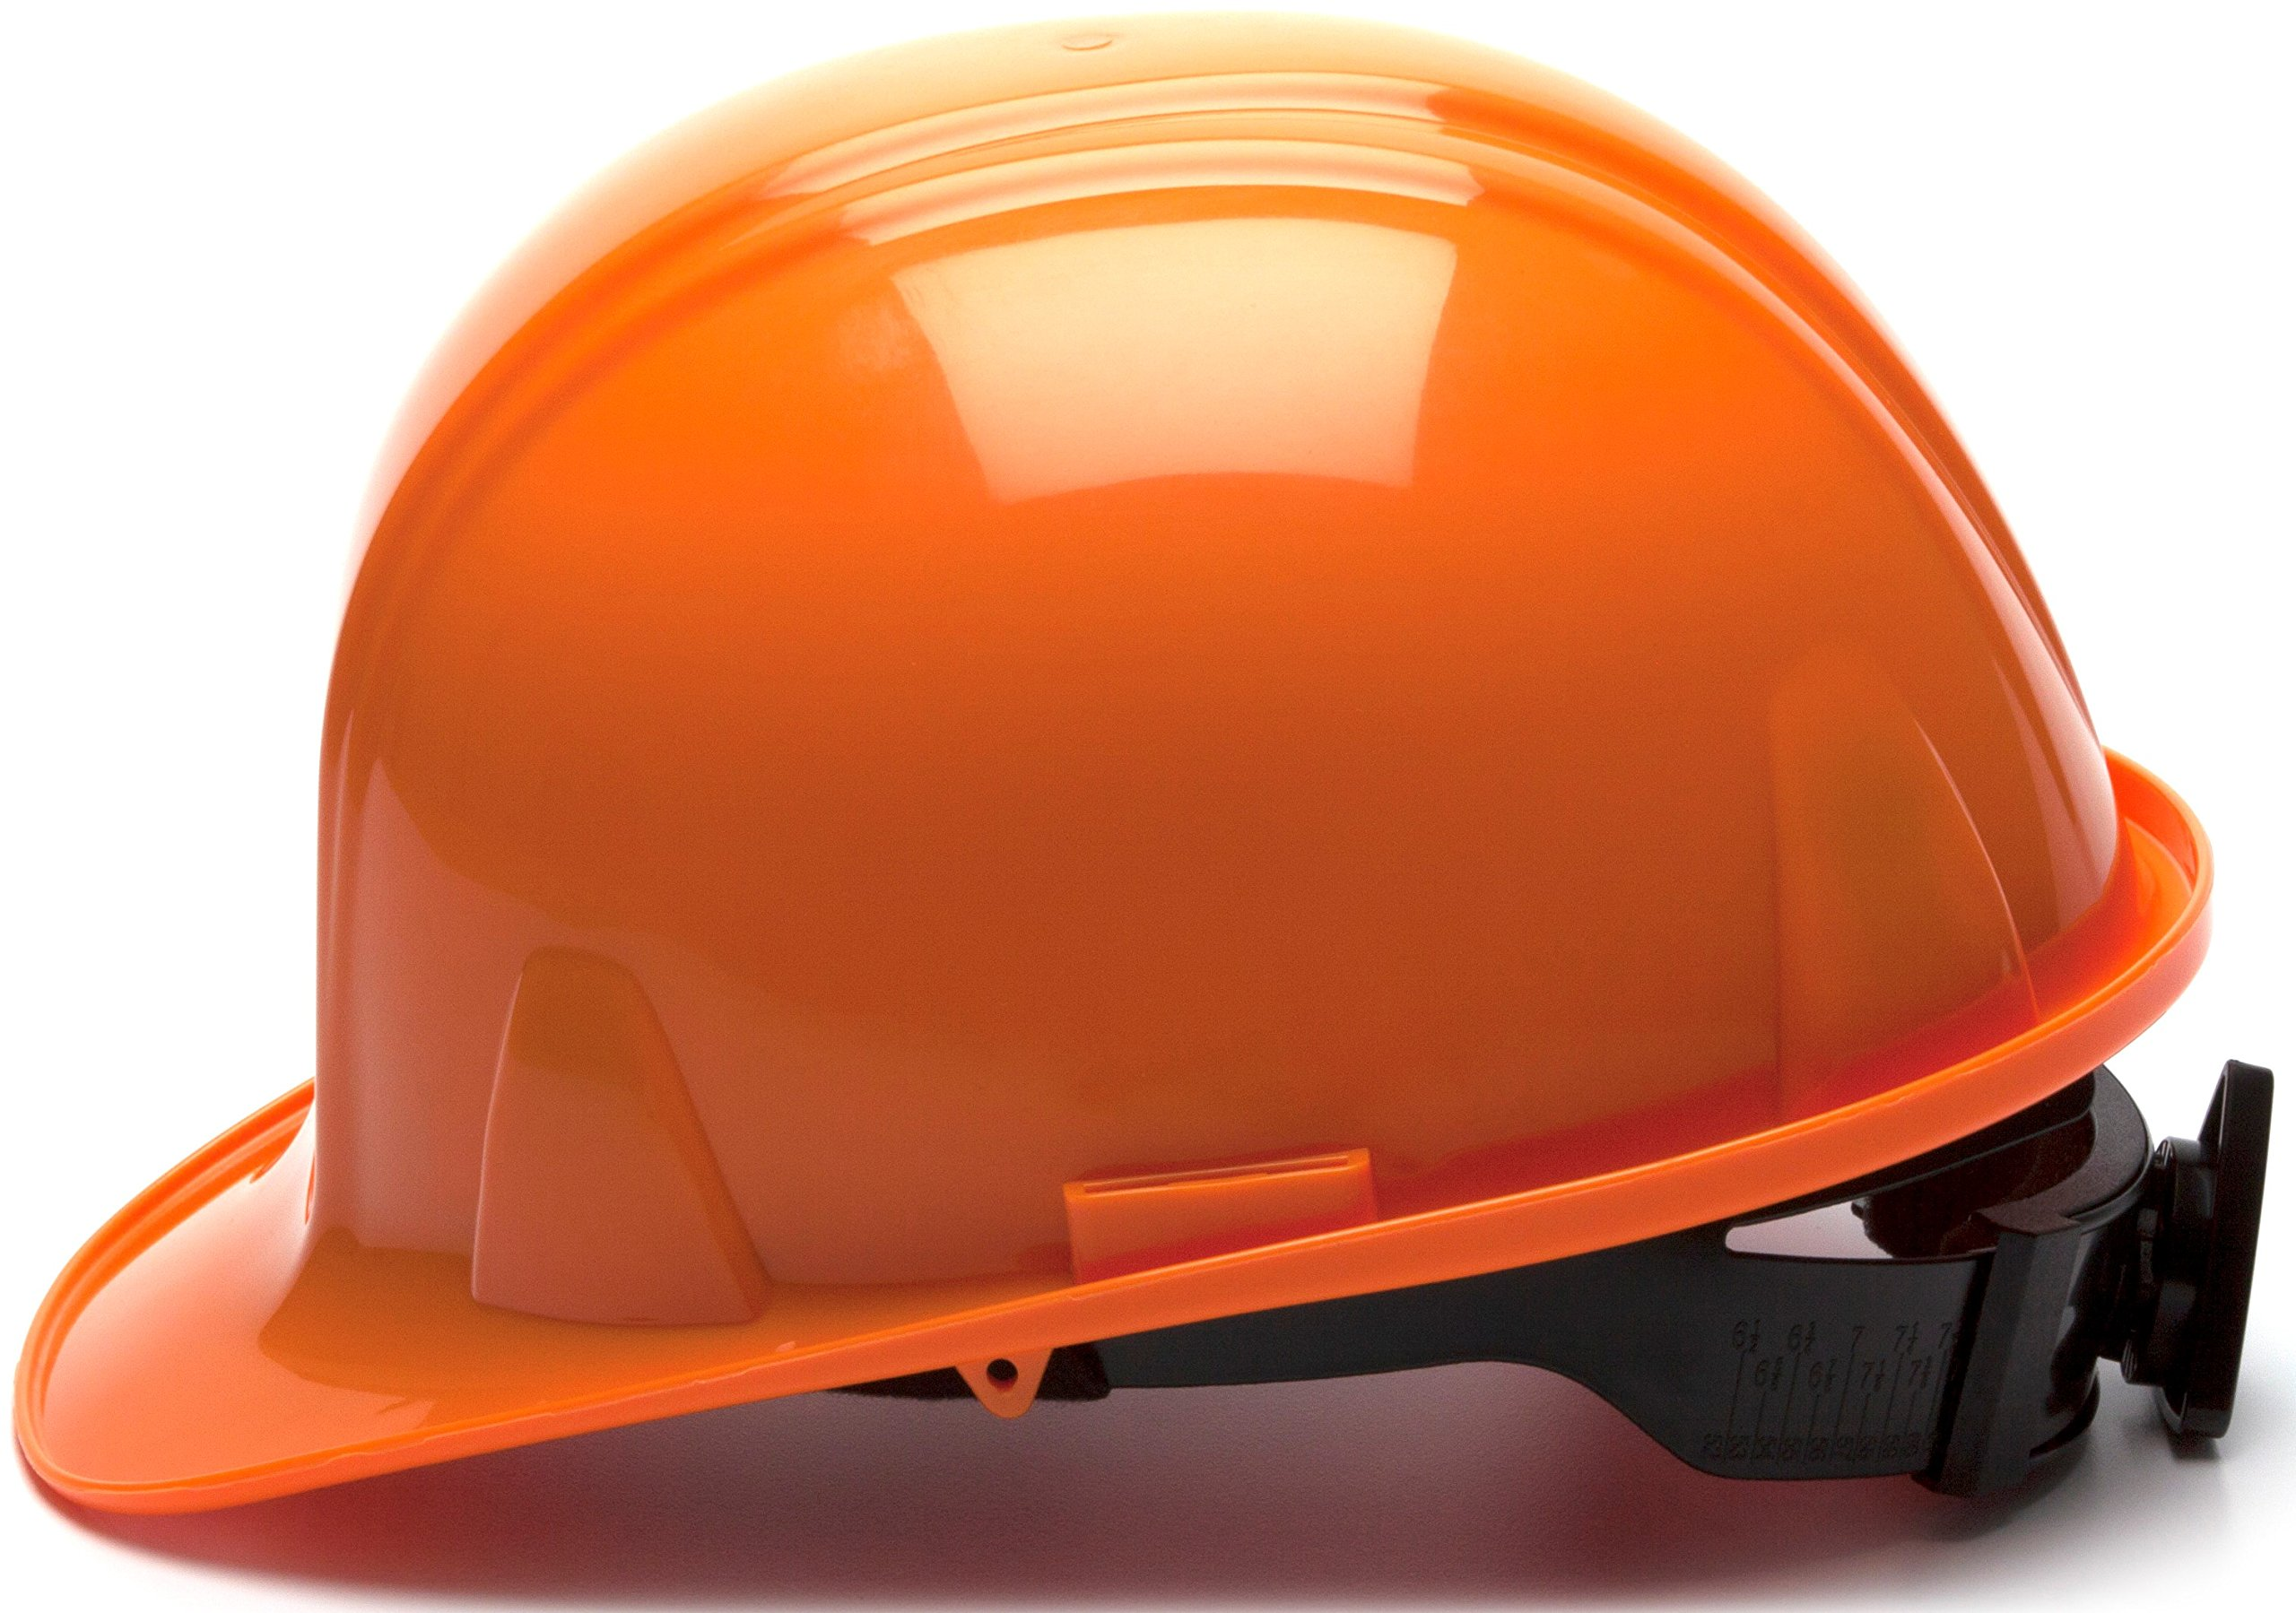 Pyramex Standard Shell Snap Lock Suspension Hard Hat, 4 Point Snap Lock Suspension, Orange by Pyramex Safety (Image #3)